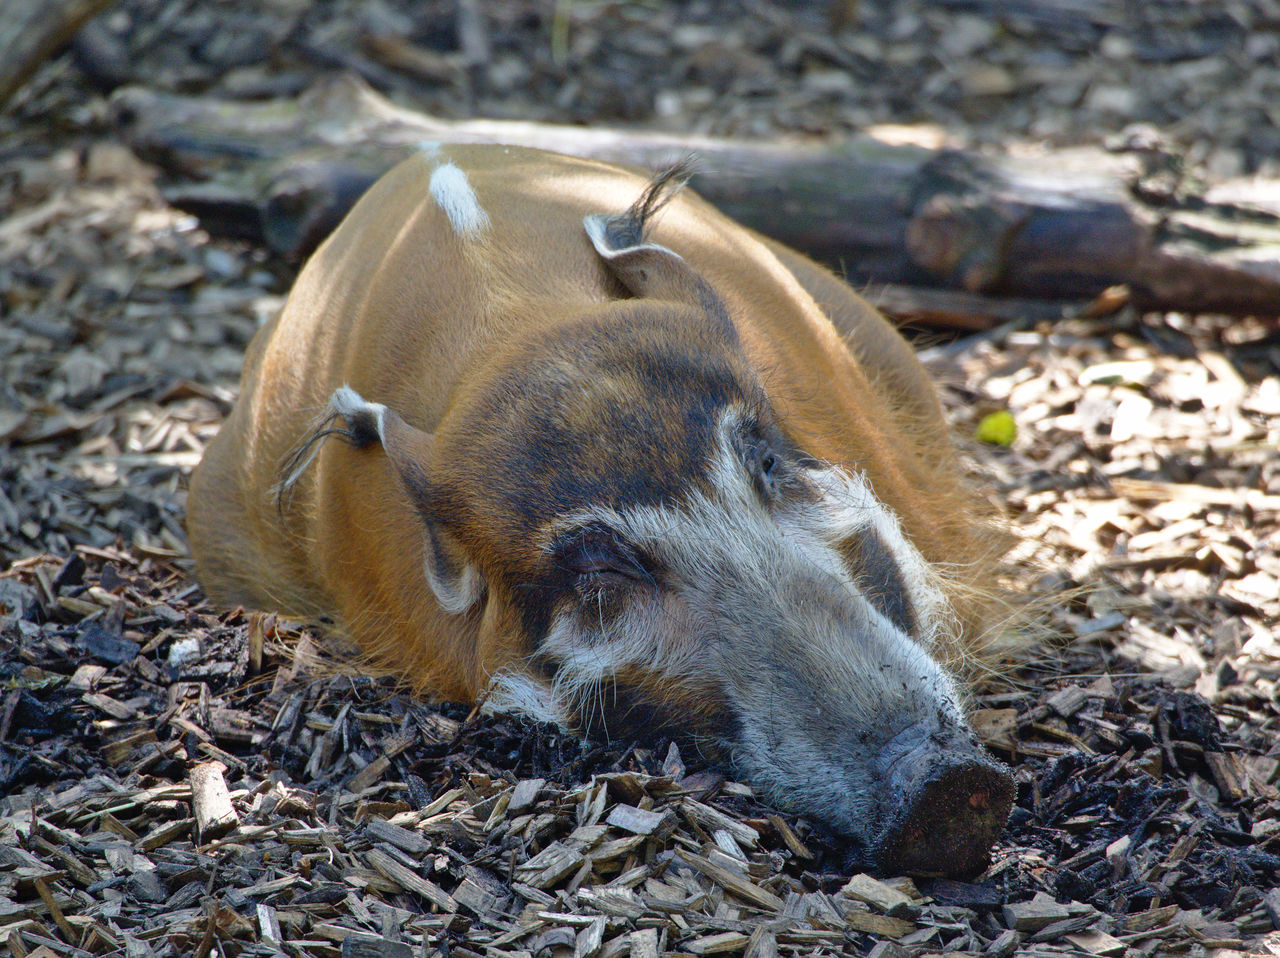 20190613_Zoo_Landau_026